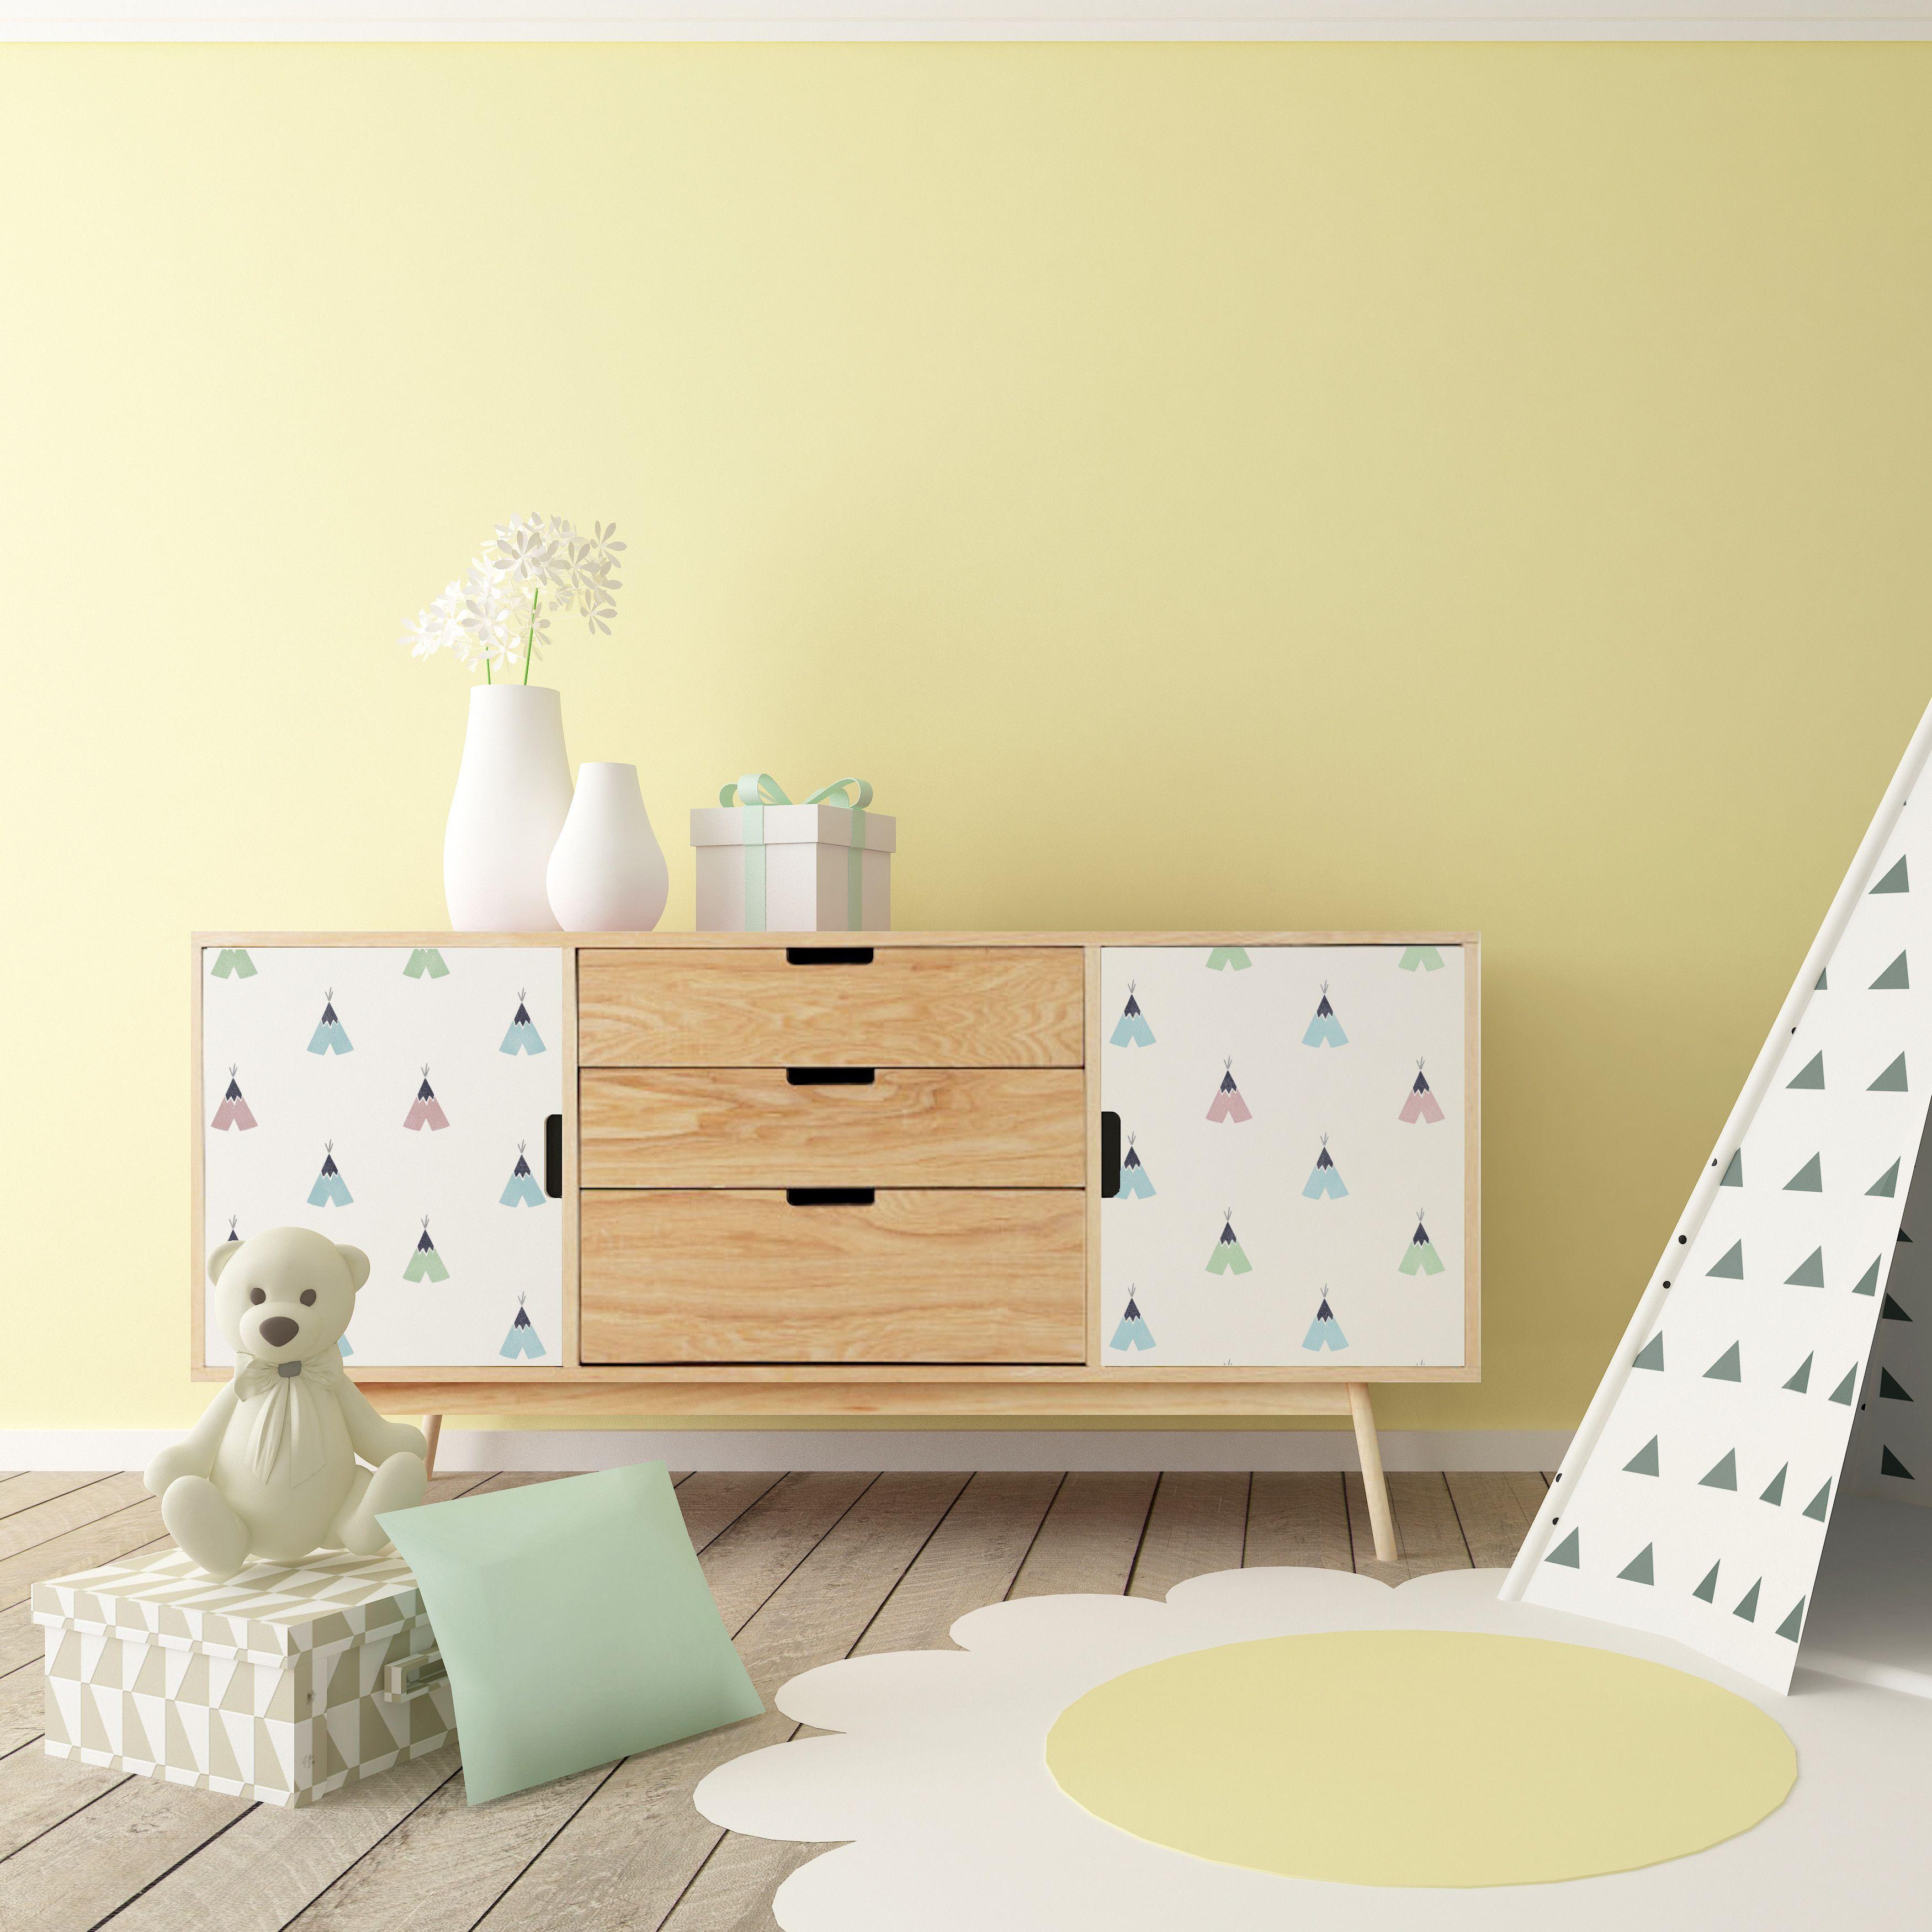 Tipi Repeat Furniture Stencil | Geometric-Modern Stencils | Pinterest